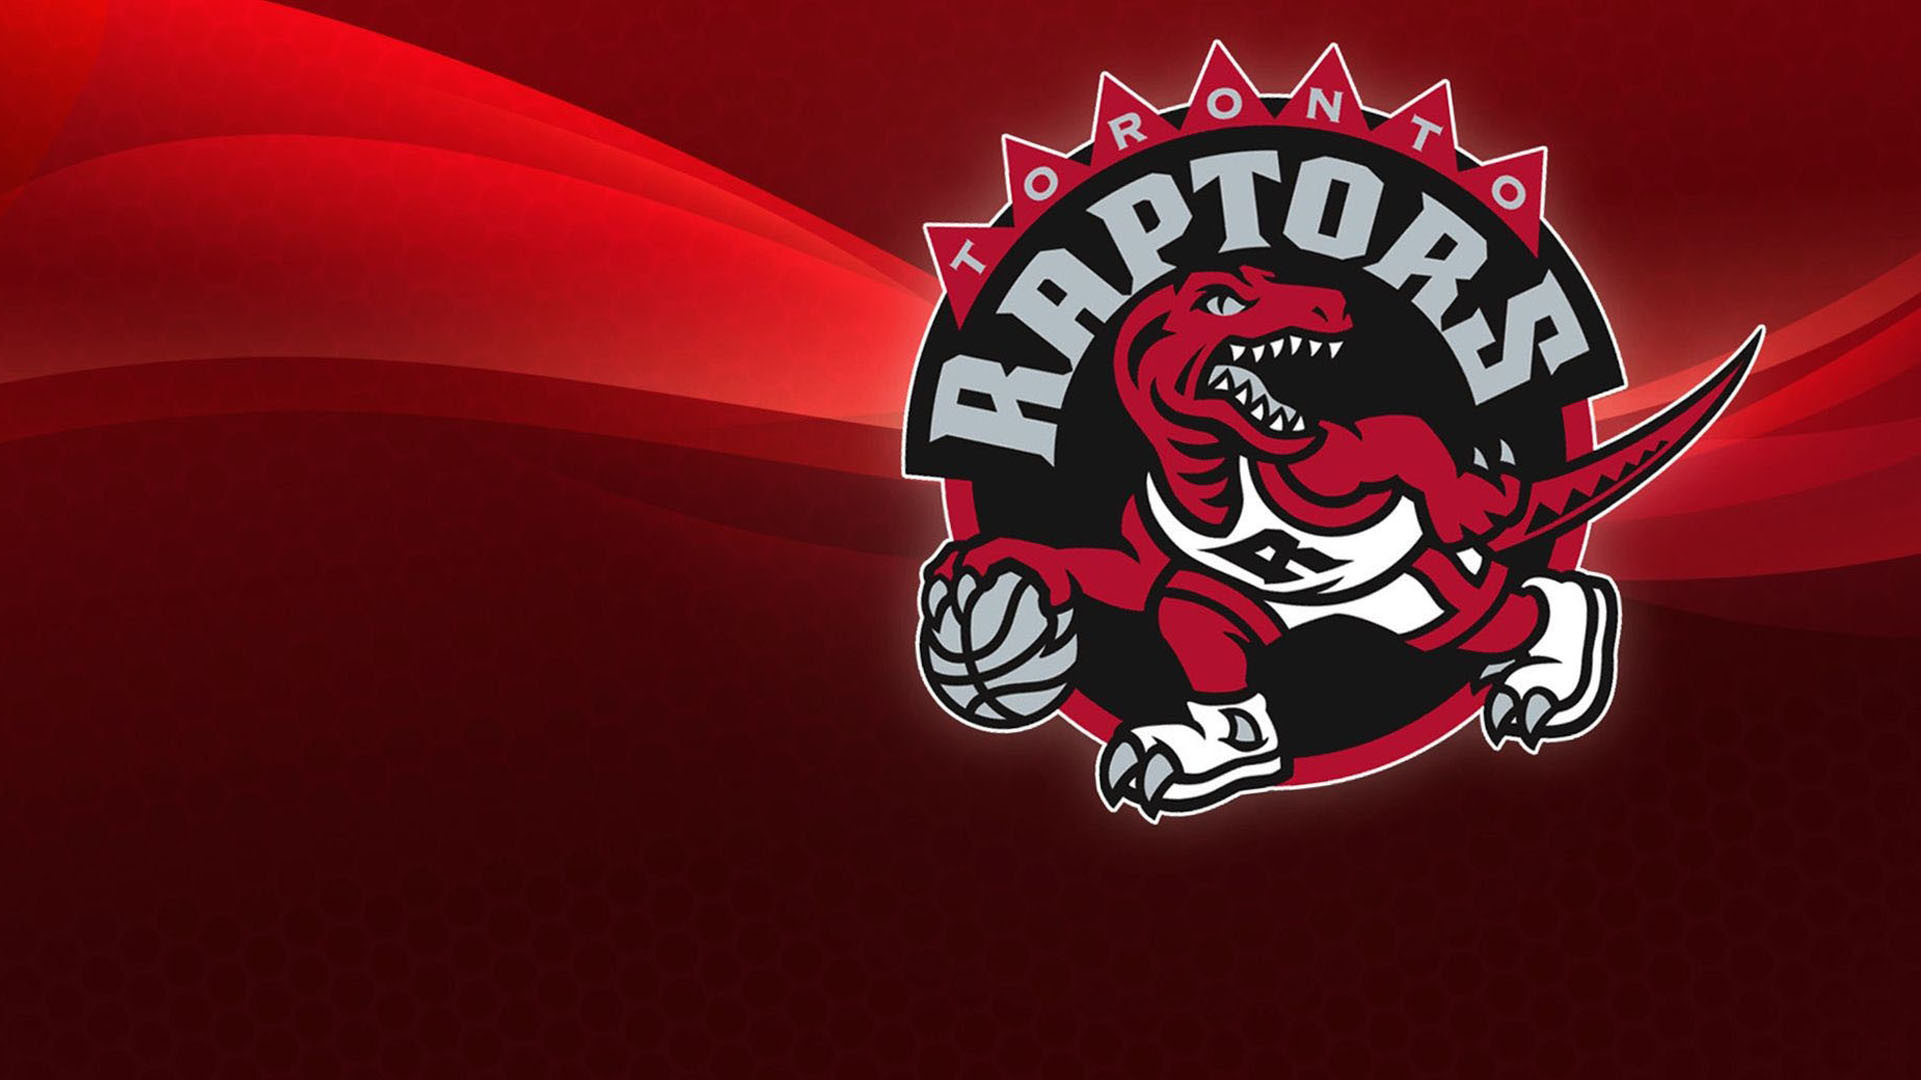 NBA Toronto Raptors Red Background Logo wallpaper